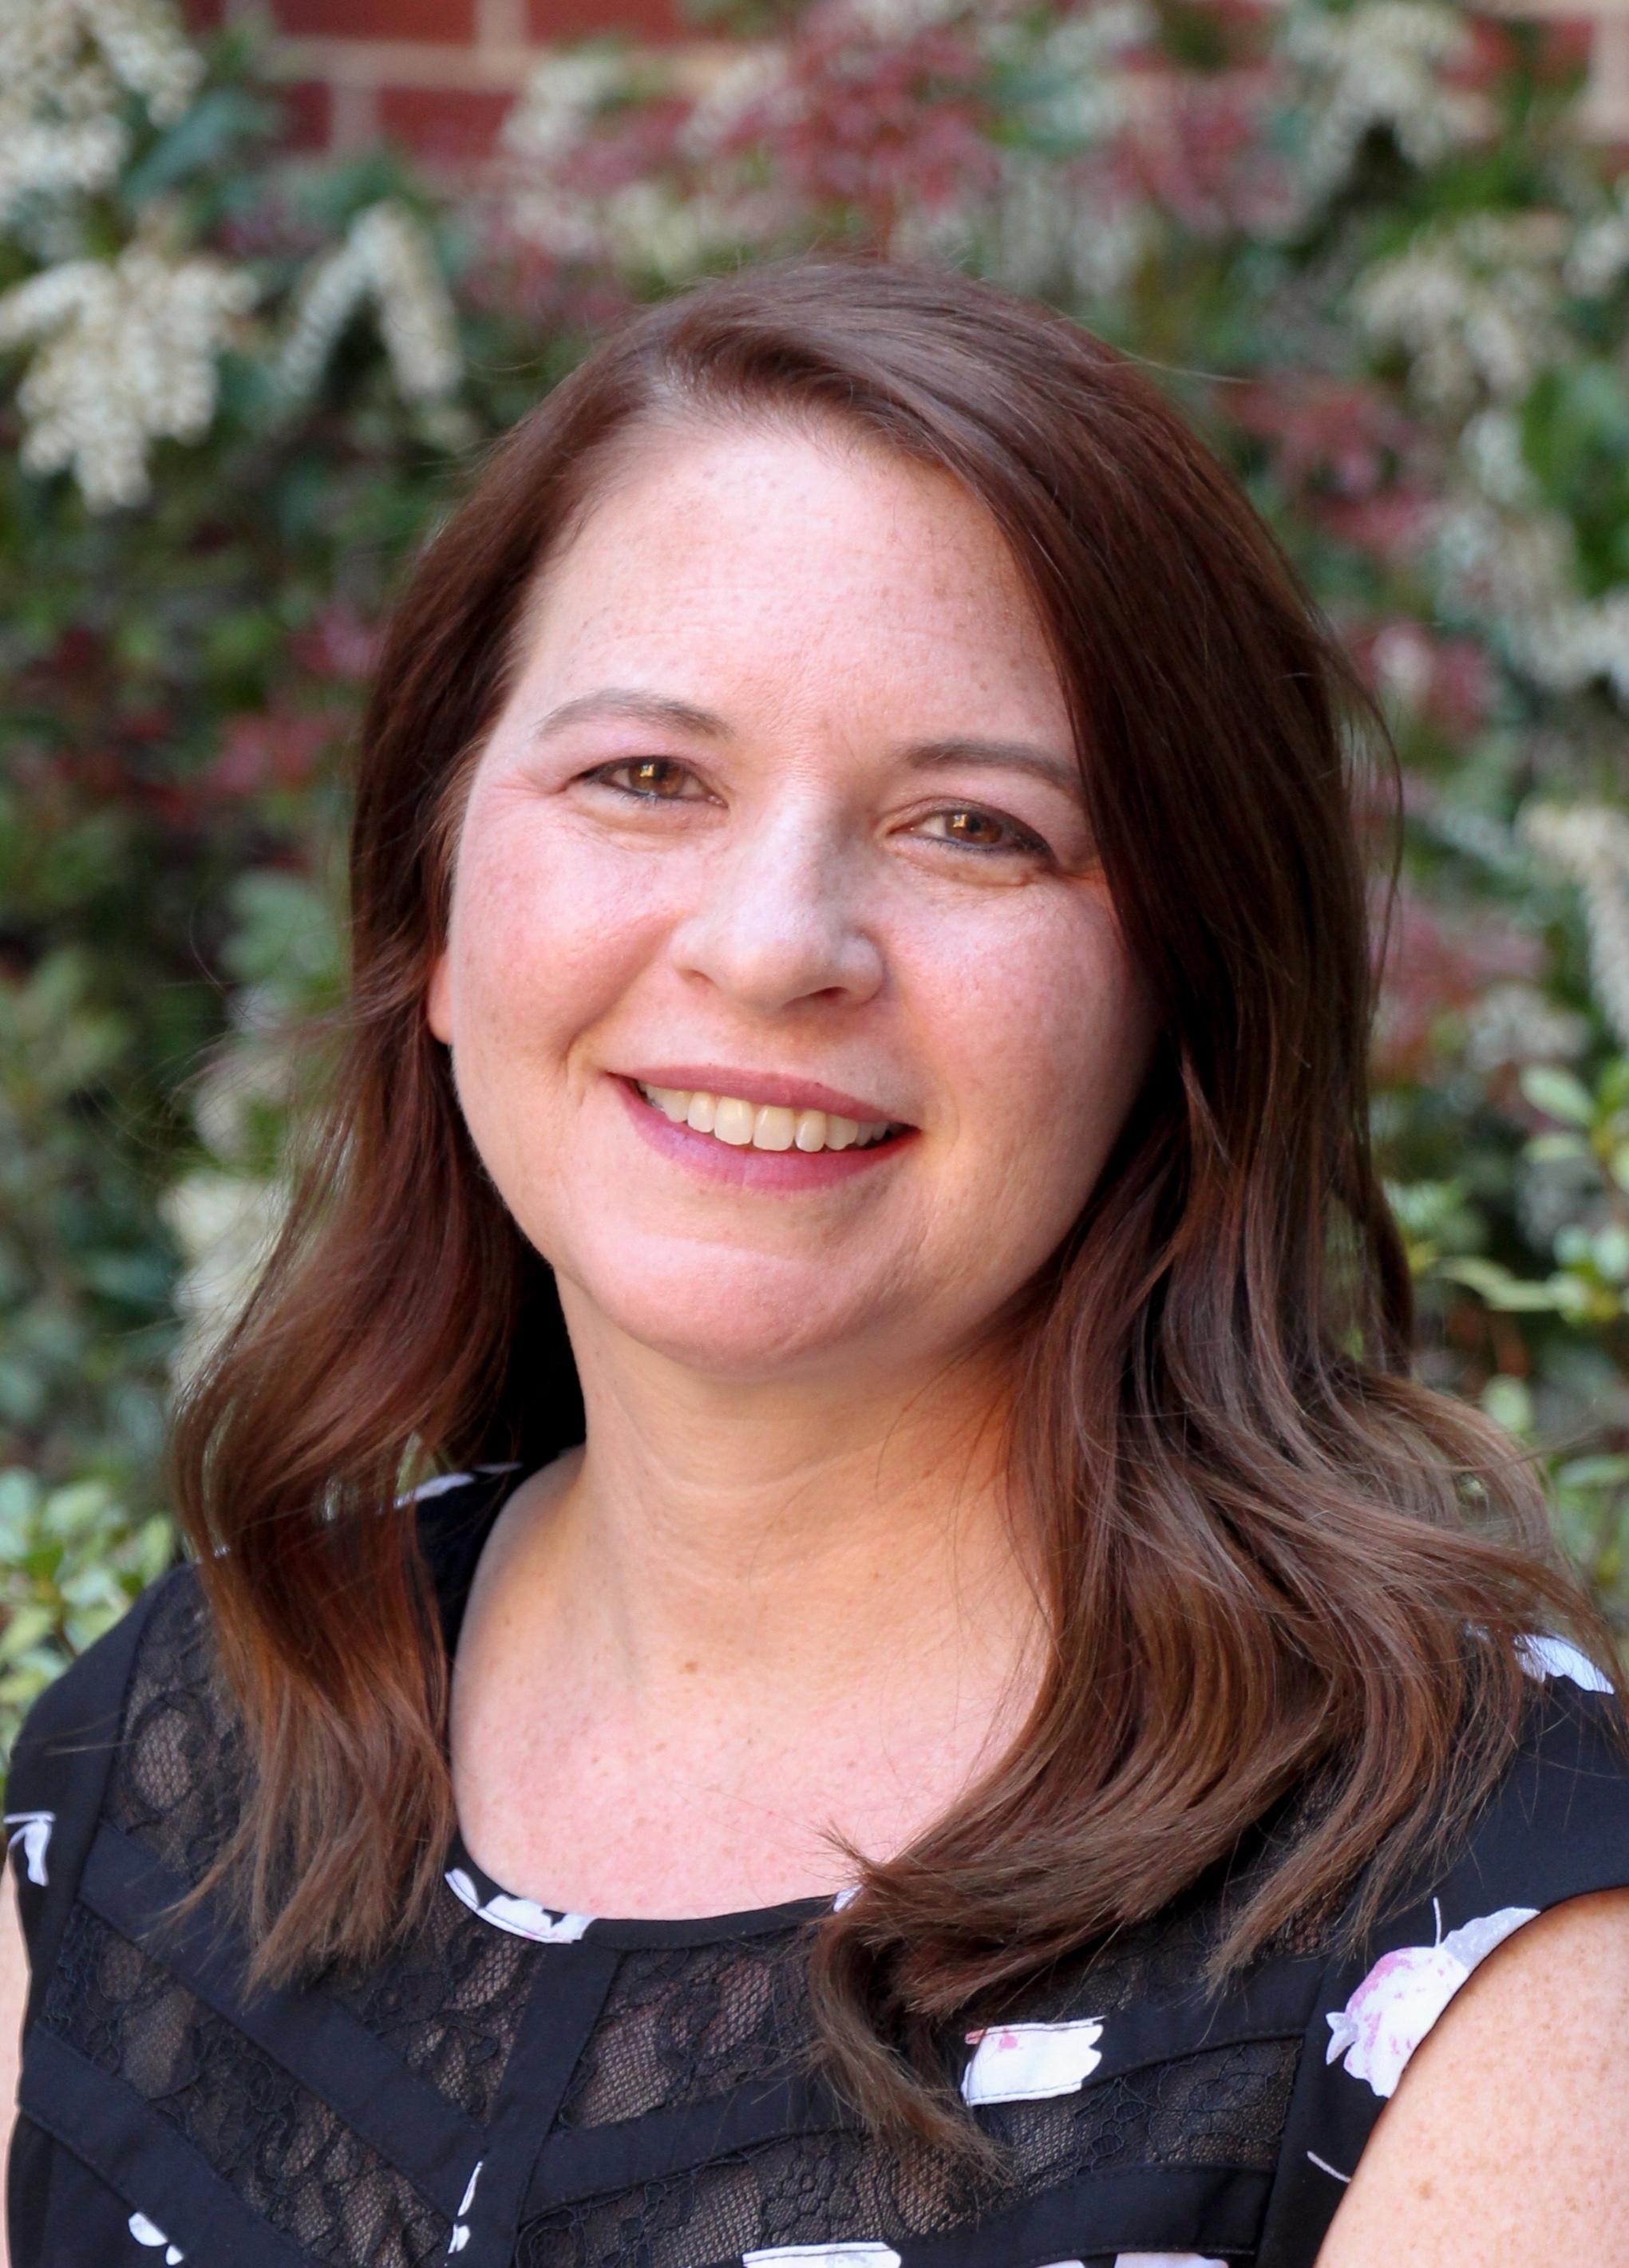 MICHELE QUESENBERRY / Childcare Coordinator - mquesenberry@bonsackbaptist.org